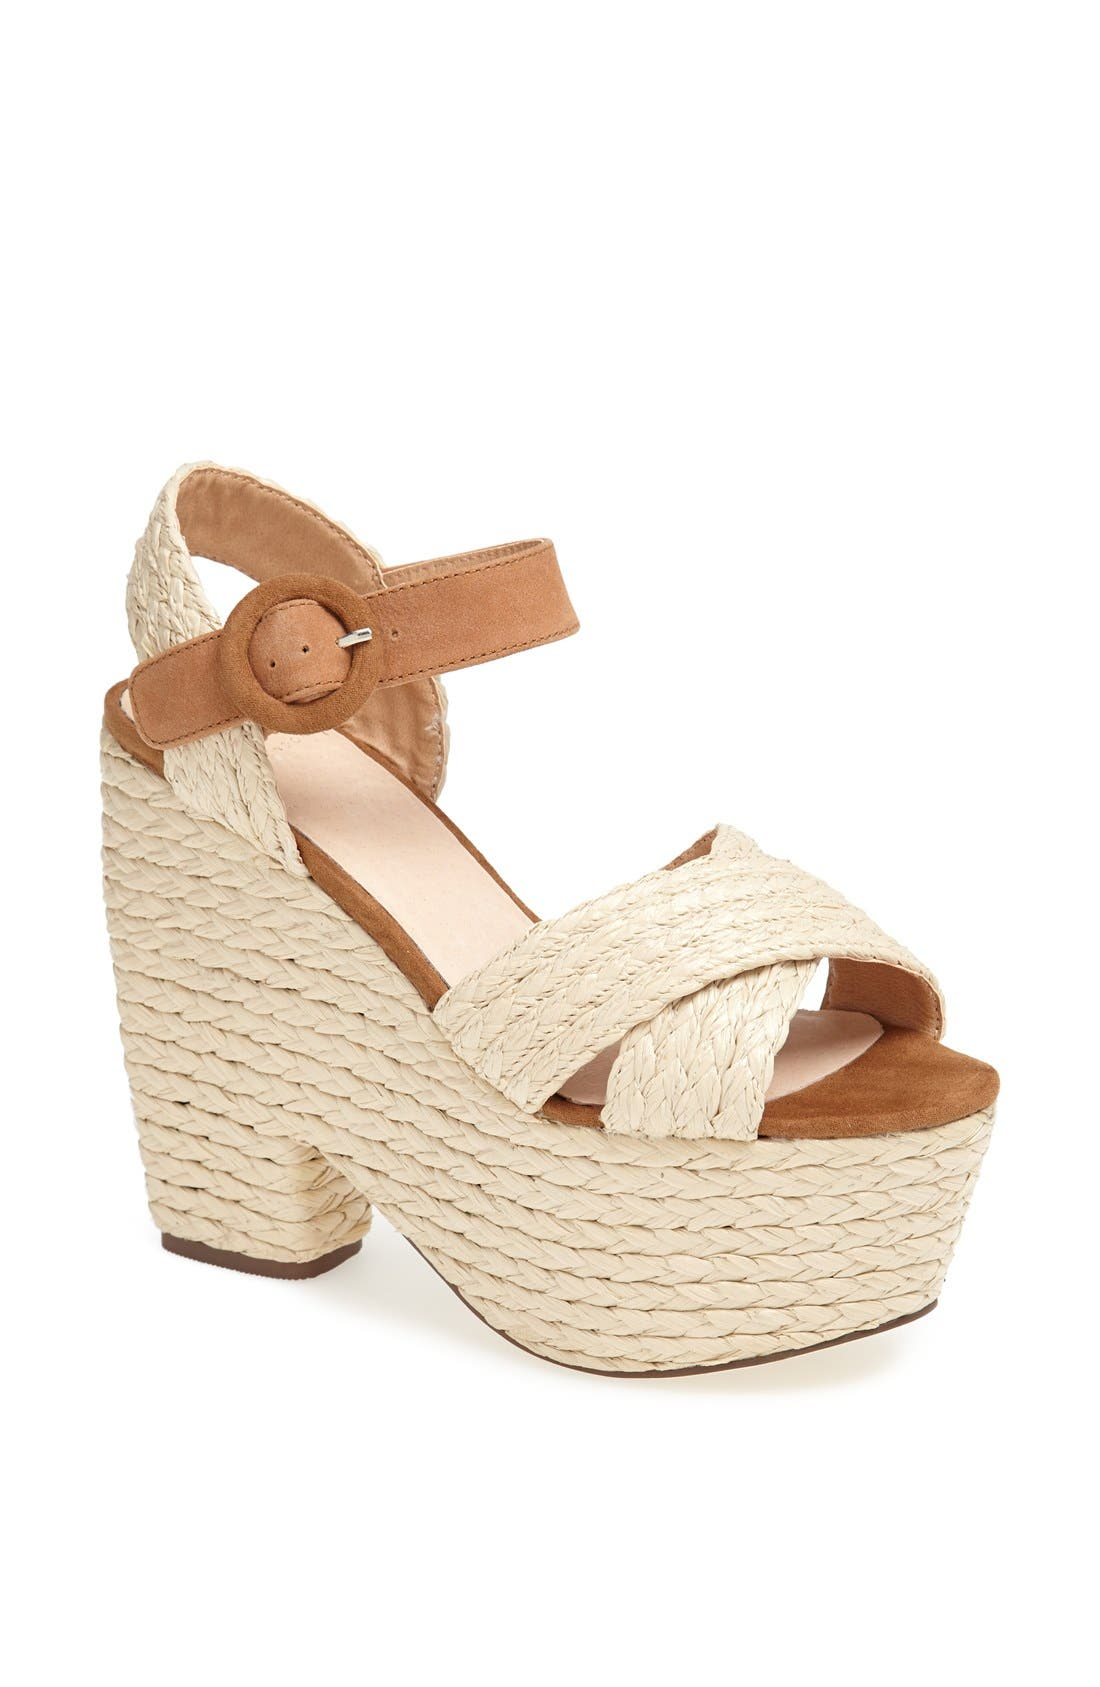 Main Image - Shellys London 'Kaawen' Sandal